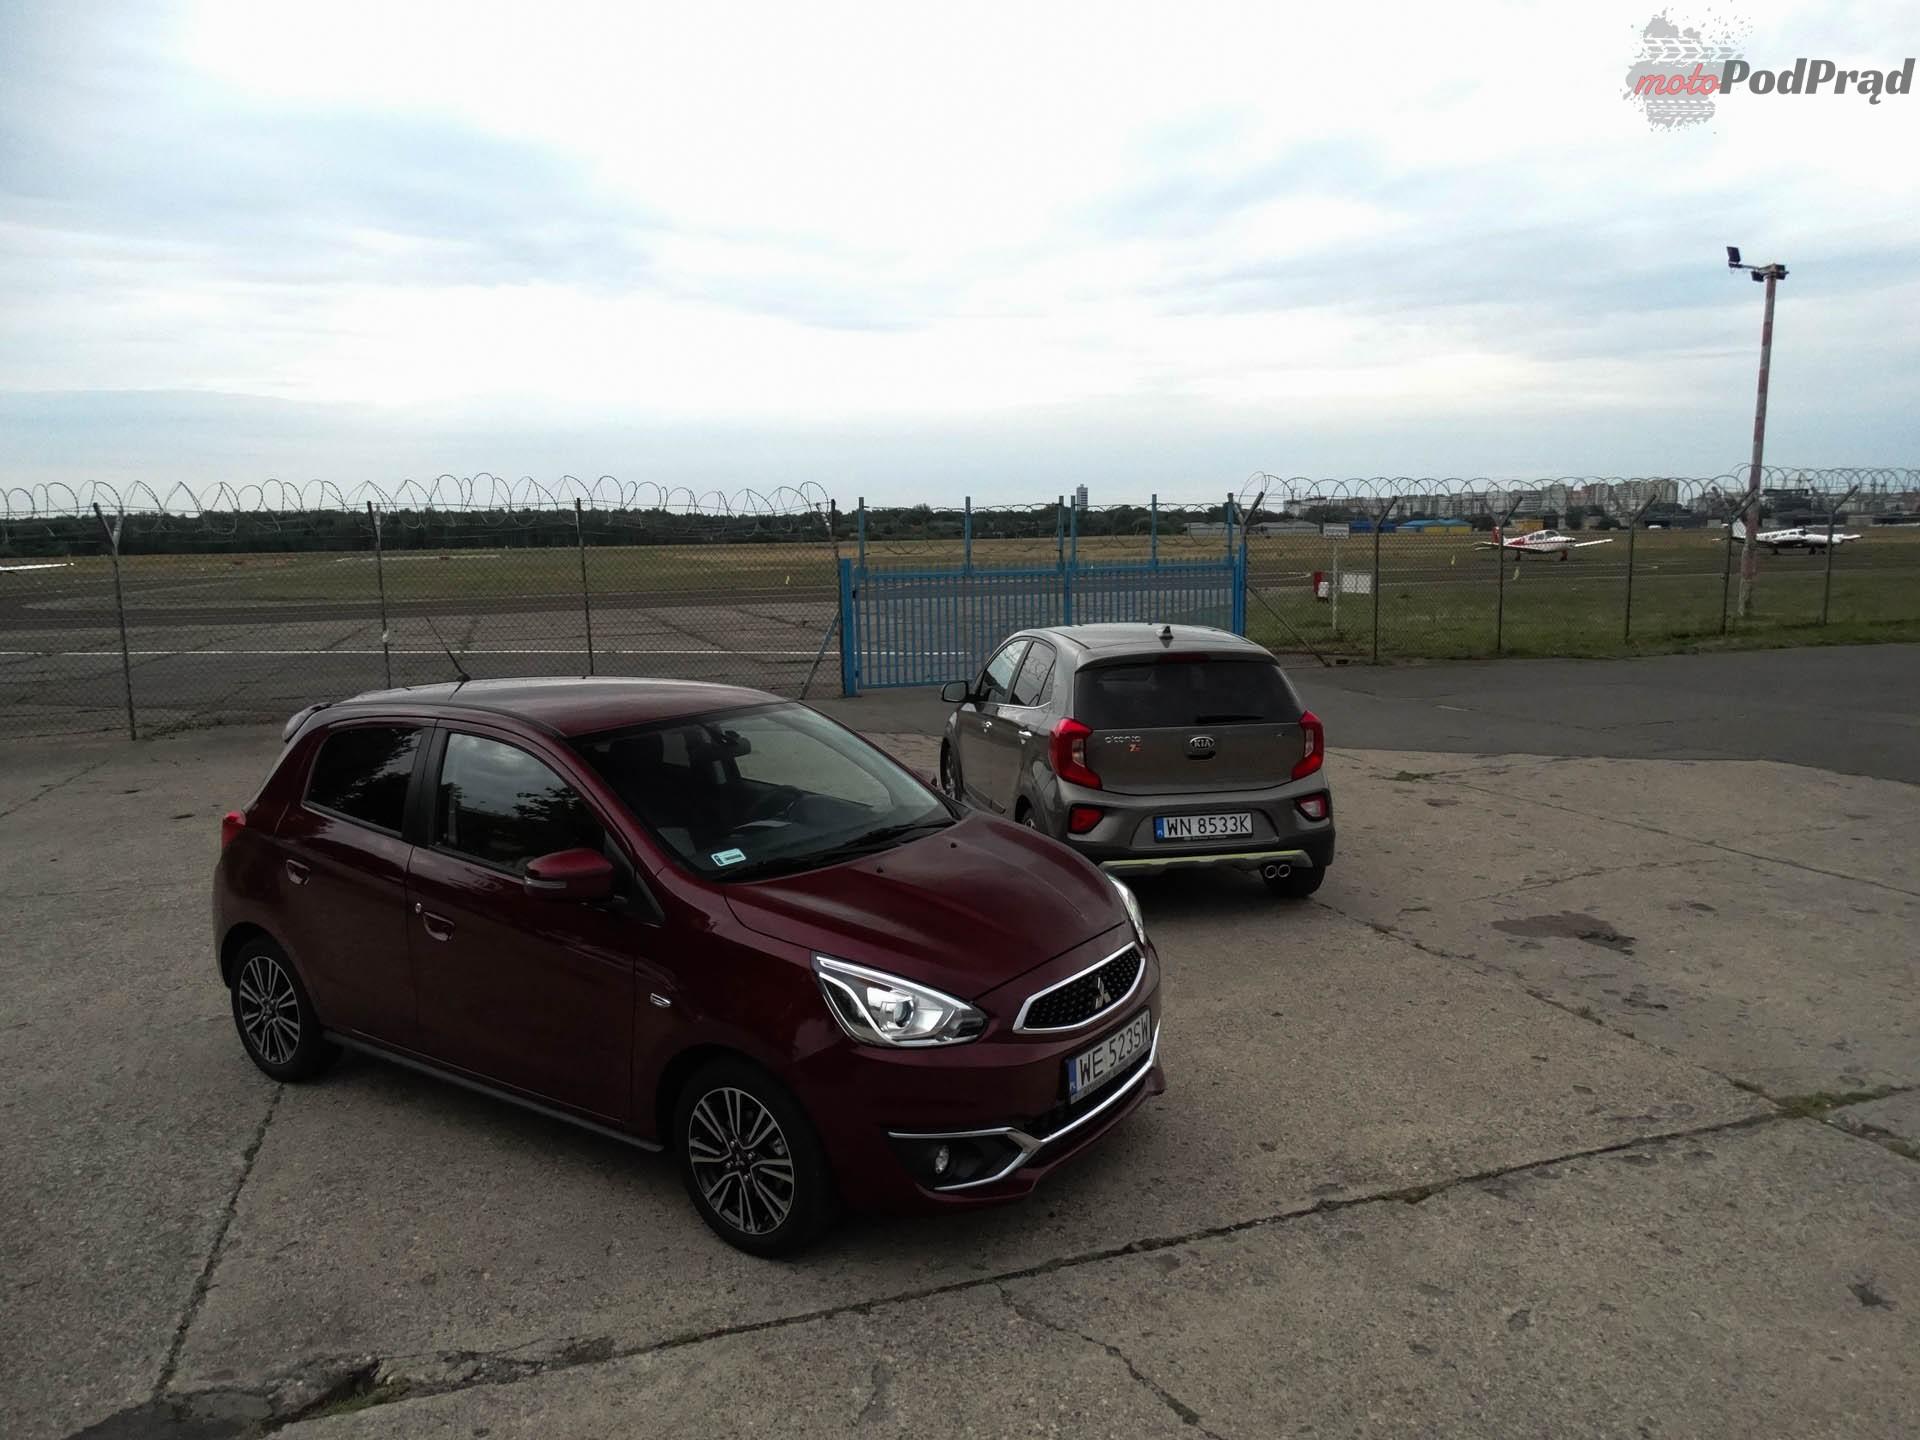 Kia Picanto vs Mitsubishi Space Star 7 Porównanie: Kia Picanto kontra Mitsubishi Space Star   dwa światy